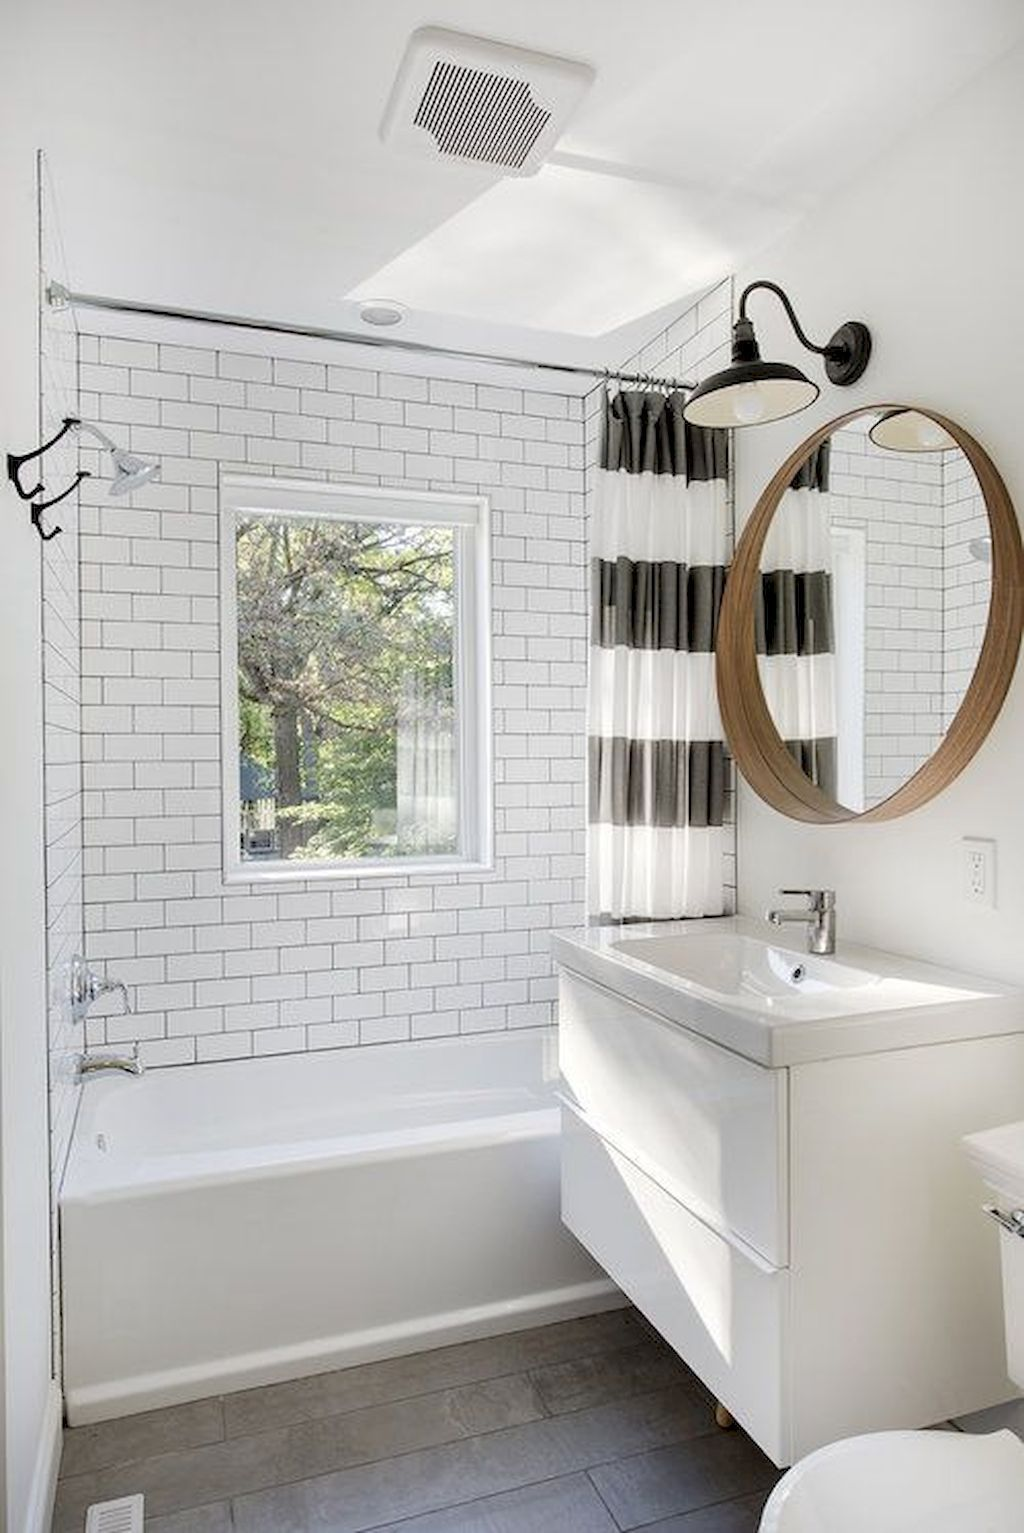 115 Modern Farmhouse Bathroom Design Ideas And Remodel Http Anjawatinews Com 115modern F Home Depot Bathroom Small Bathroom Remodel Modern Farmhouse Bathroom